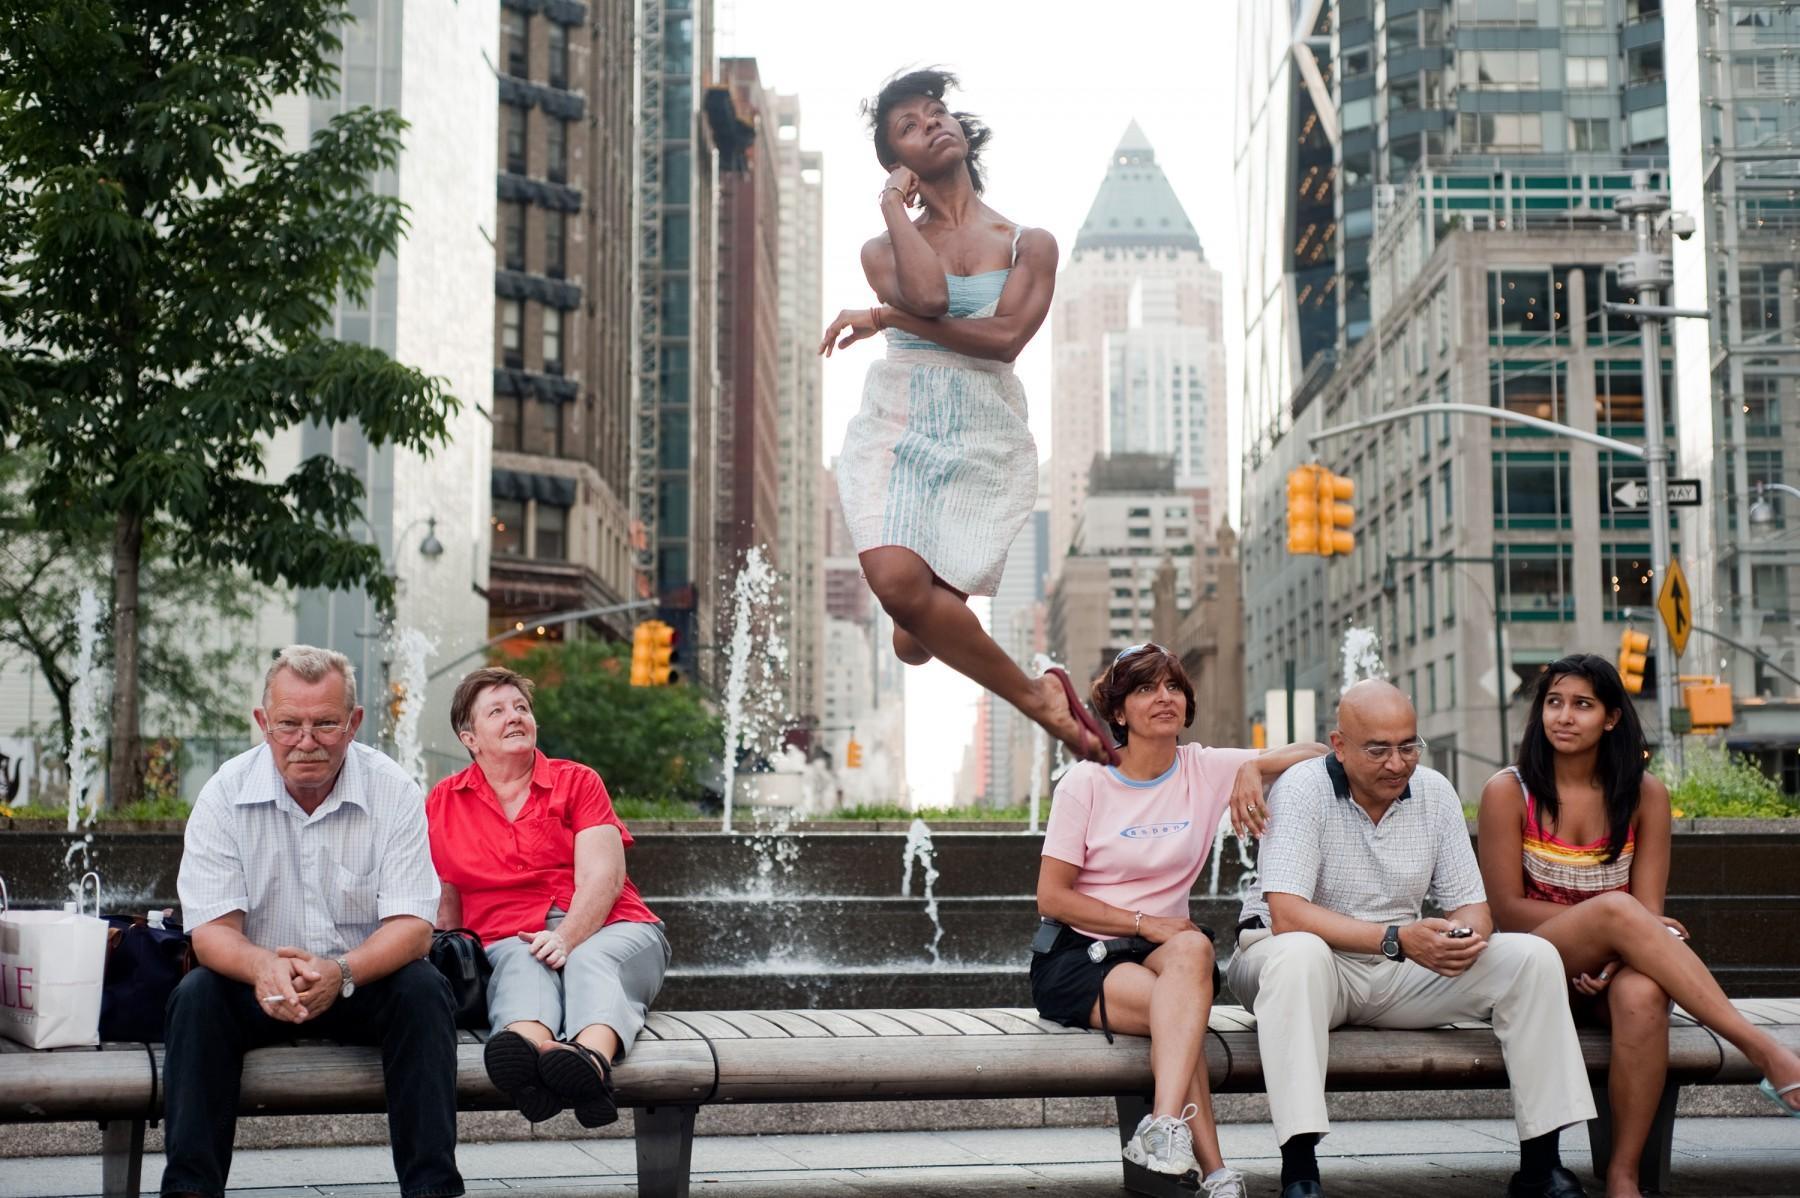 Dancers-Among-Us-in-Columbus-Circle-Michelle-Fleet